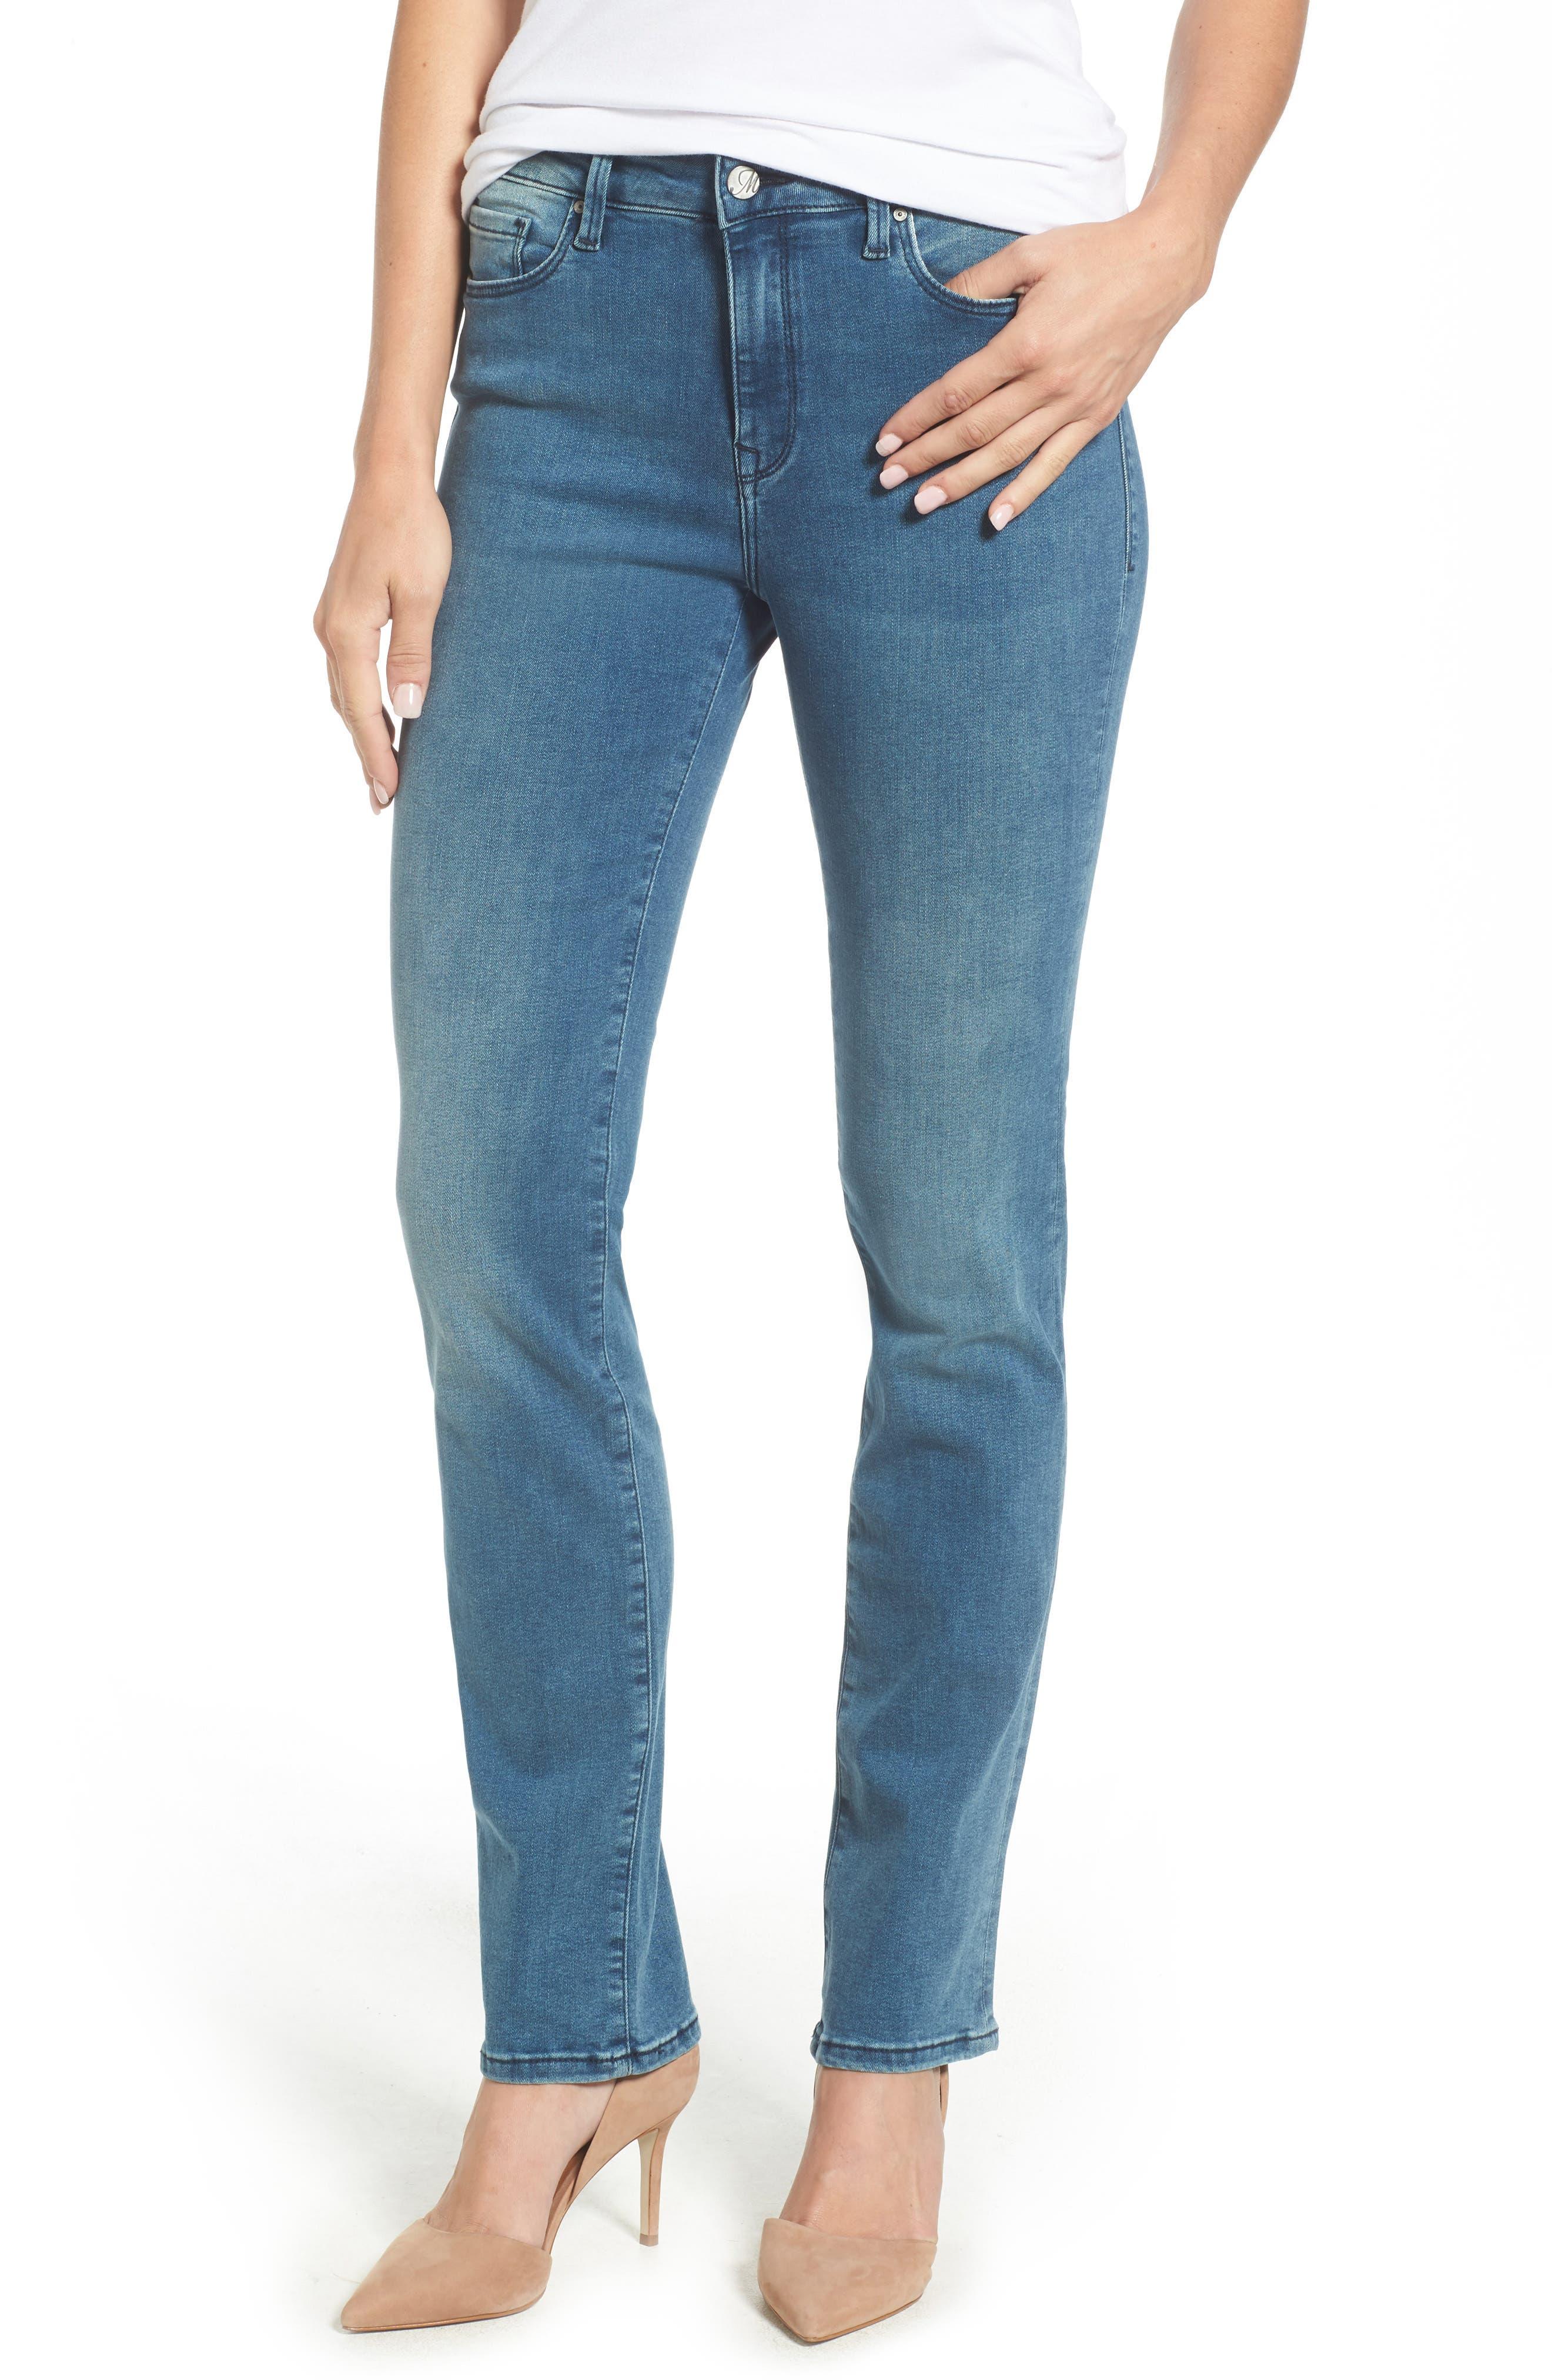 Kendra High Waist Straight Leg Jeans,                             Main thumbnail 1, color,                             420